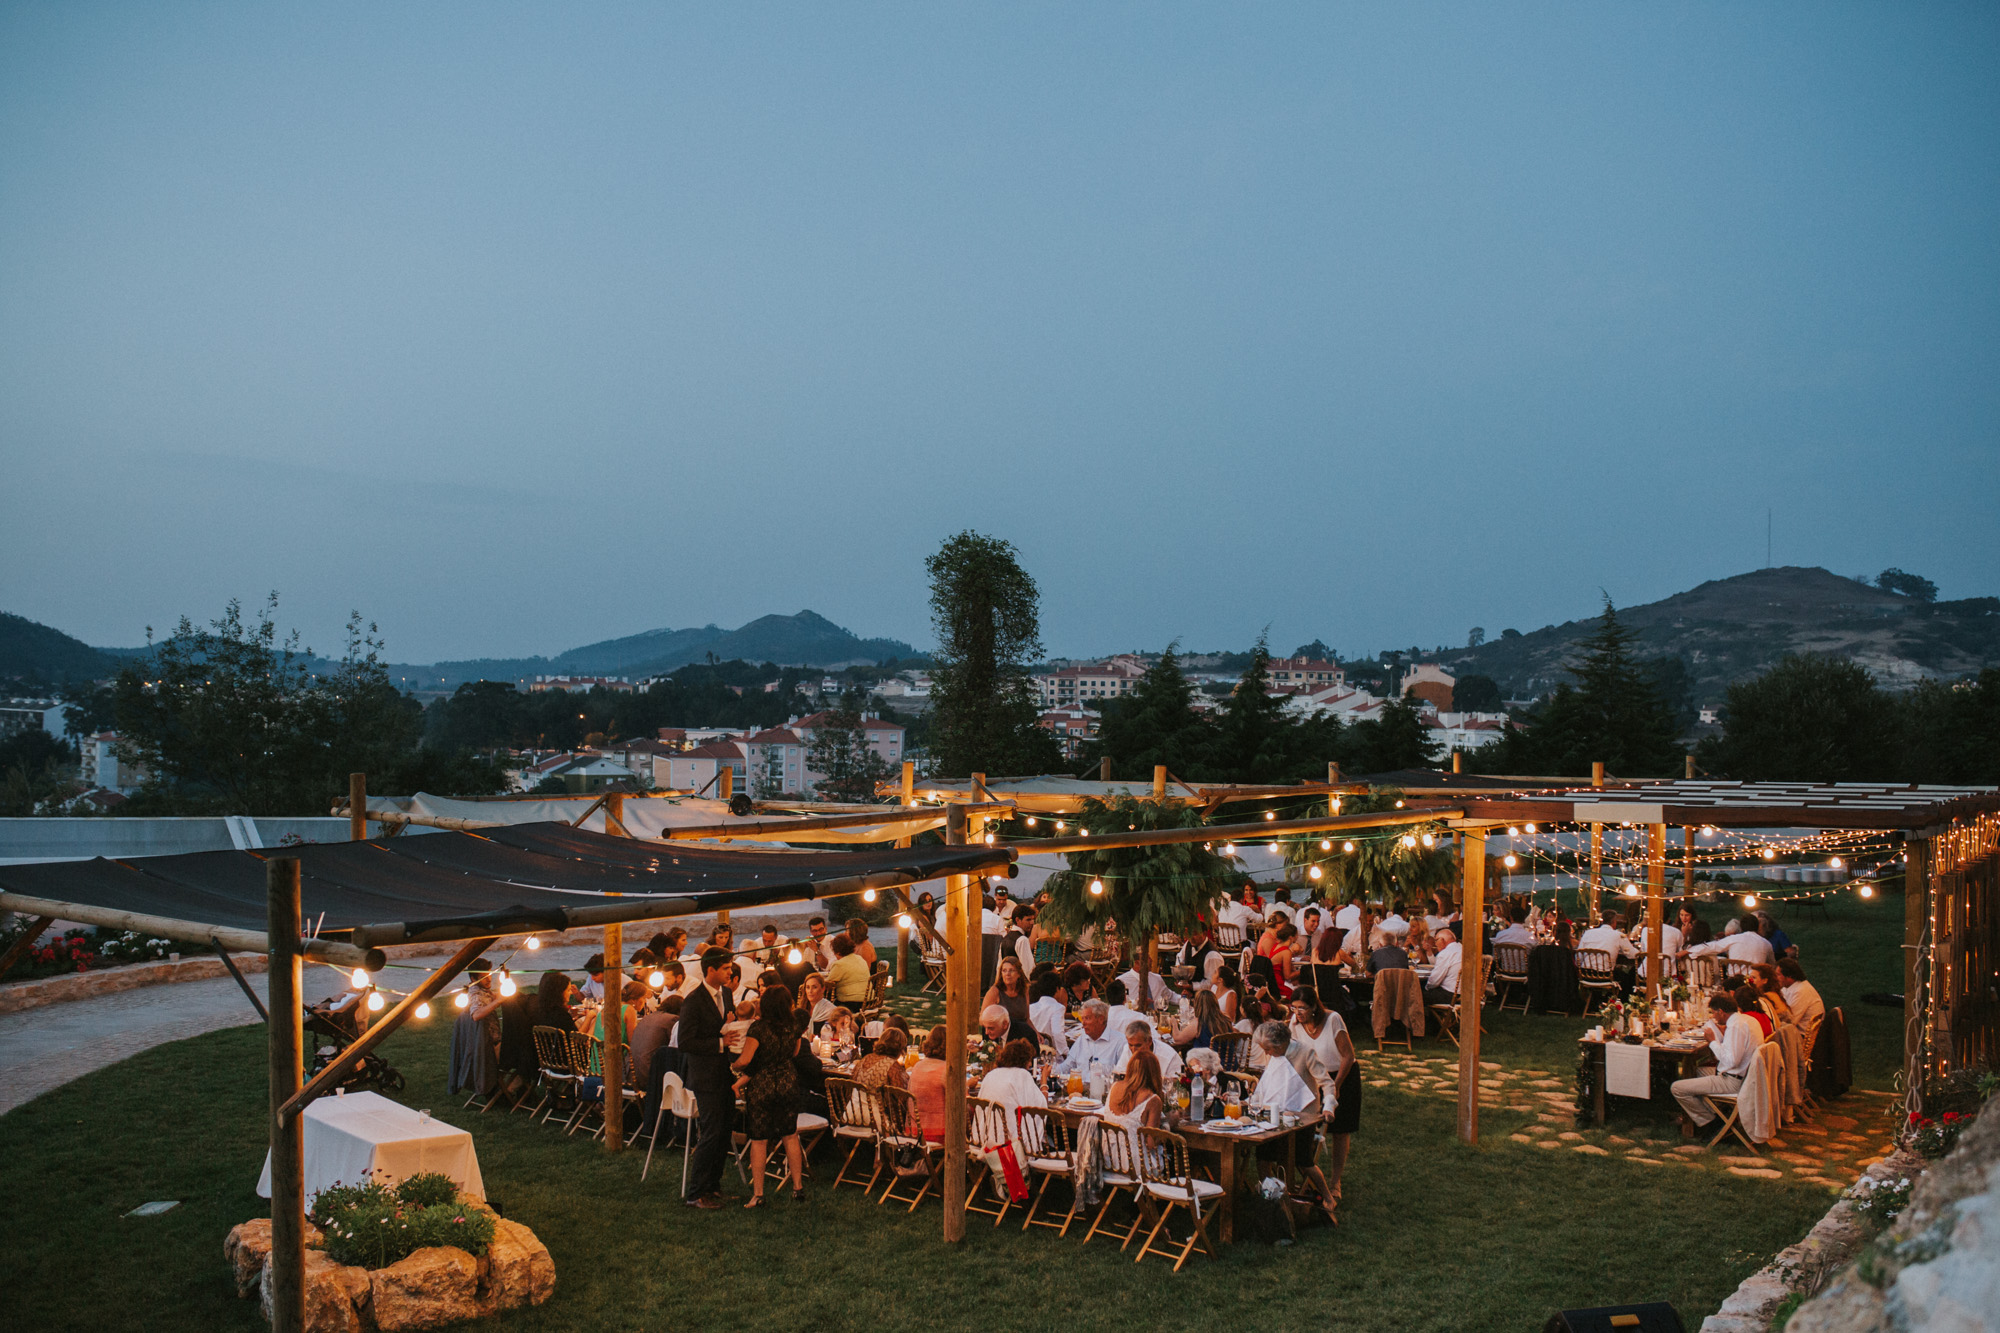 014-carina-e-samuel-wedding-casamento-quinta-dos-rouxinois-rustico-my-fancy-wedding-mafra-malveira-lisboa-sintra-cascais-filipe-santiago-fotografia-fotografo-lifestyle-destination-portugal